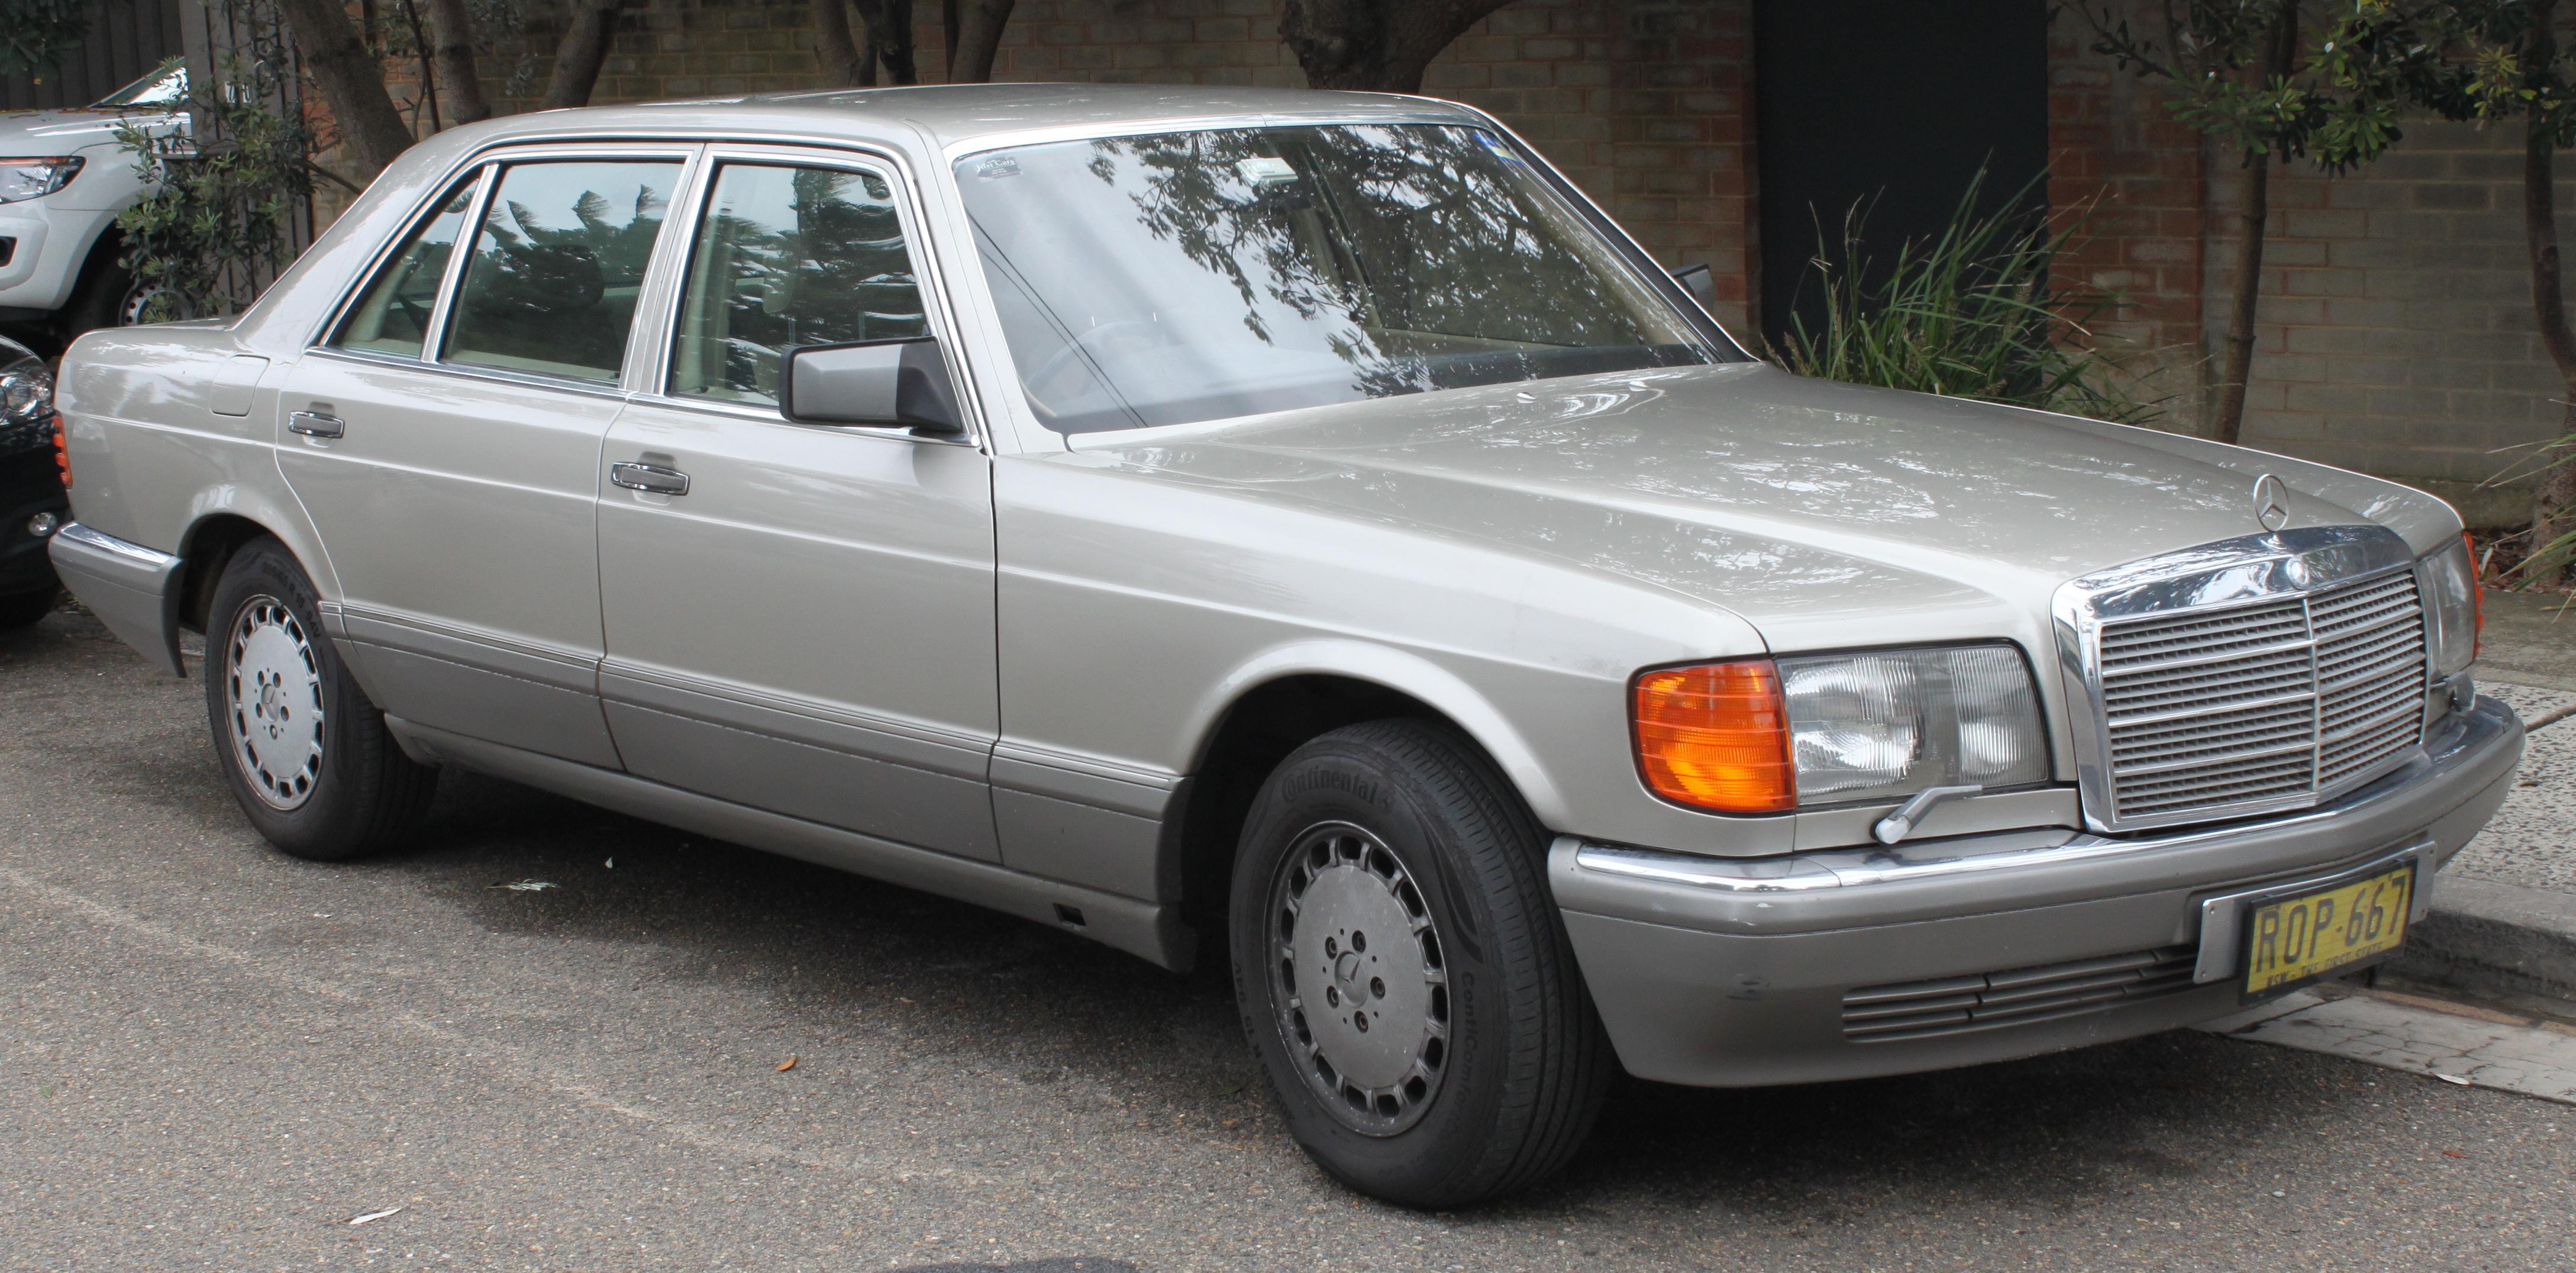 Frank S Car Wash Sumter Sc